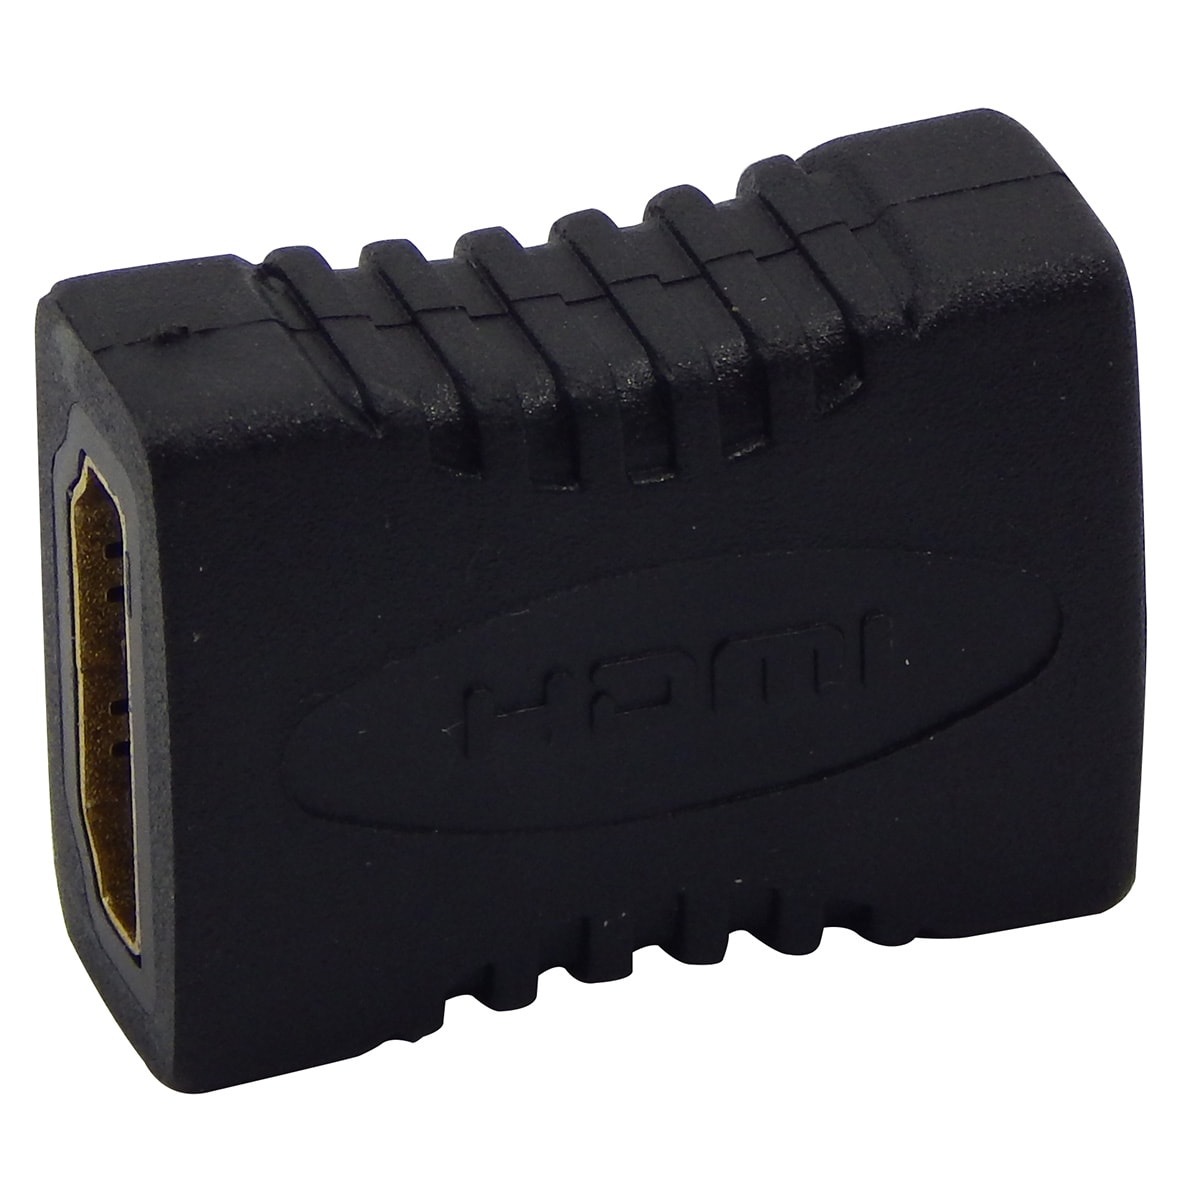 Adaptador Emenda HDMI Fêmea x HDMI Fêmea